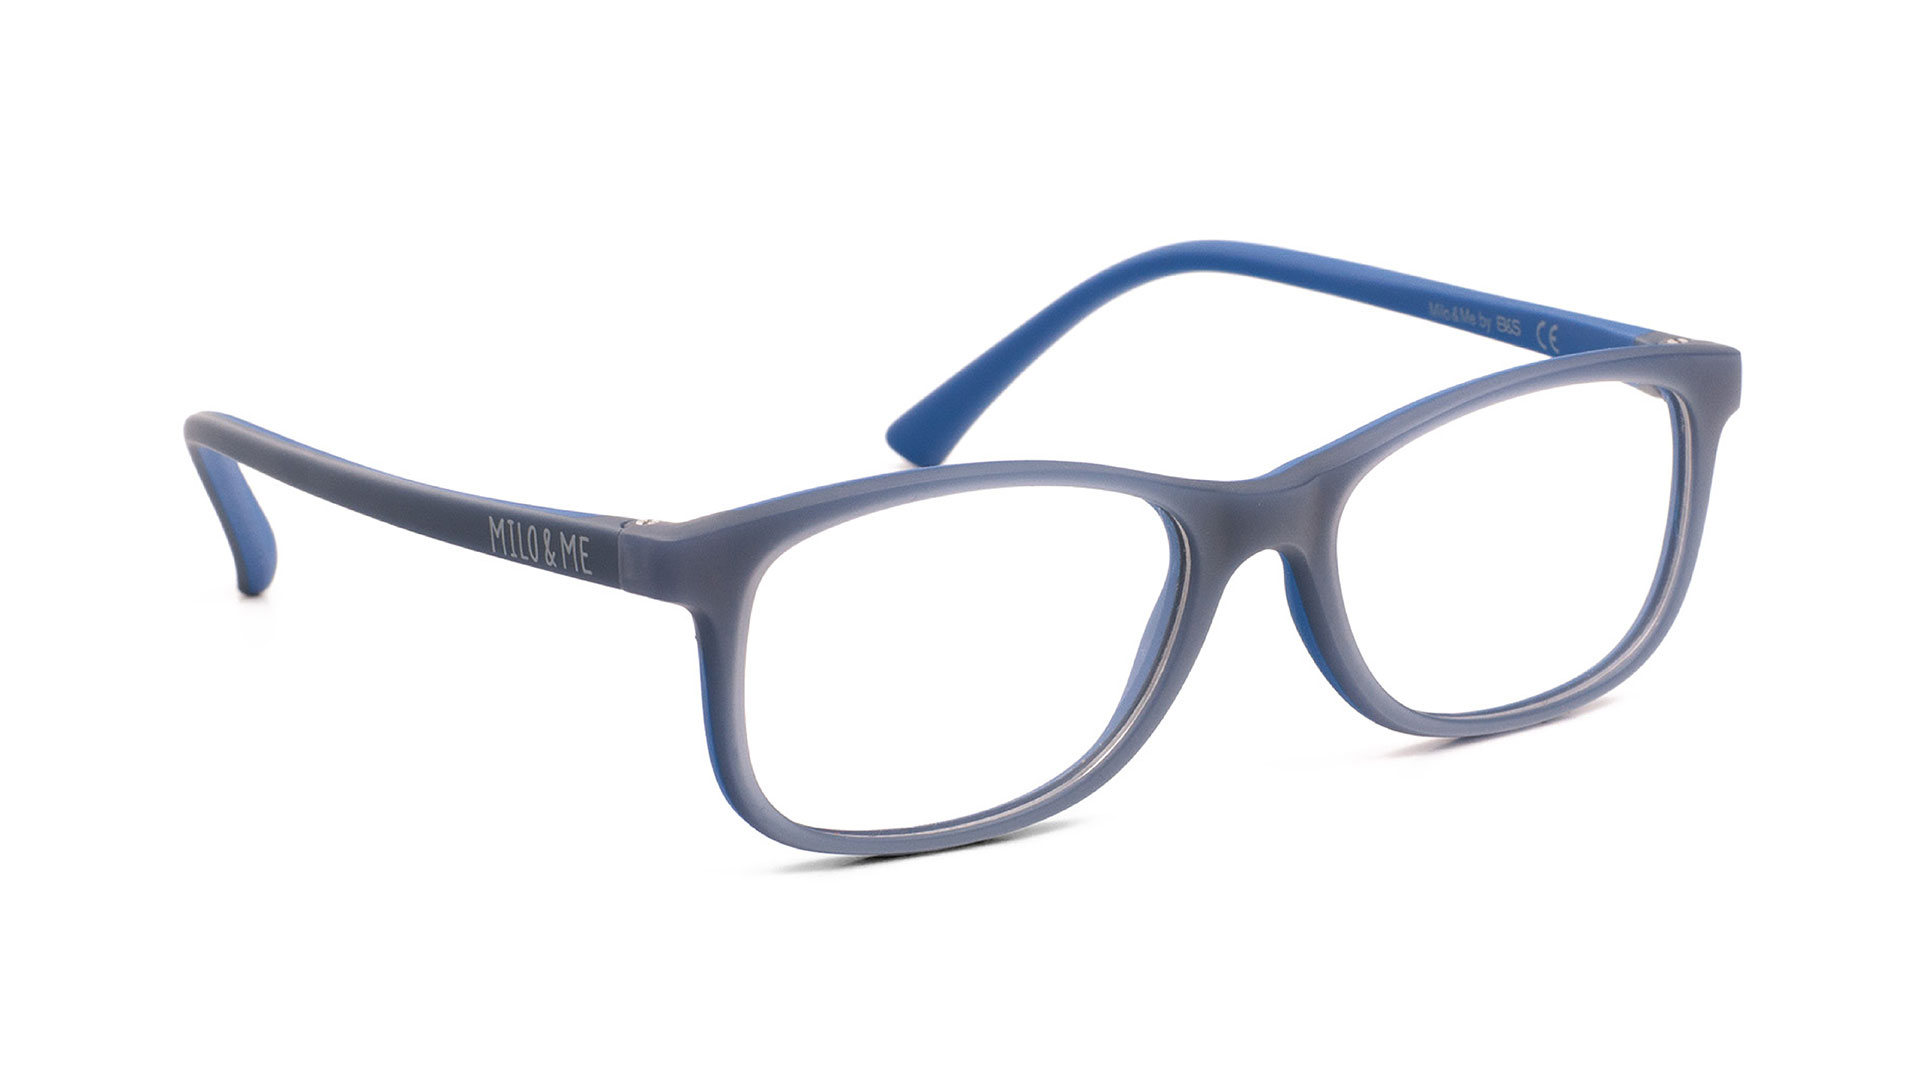 Grey Blue Blue H85040-20 - Milo & Me Eyewear - Optimum RX Lens Specialists